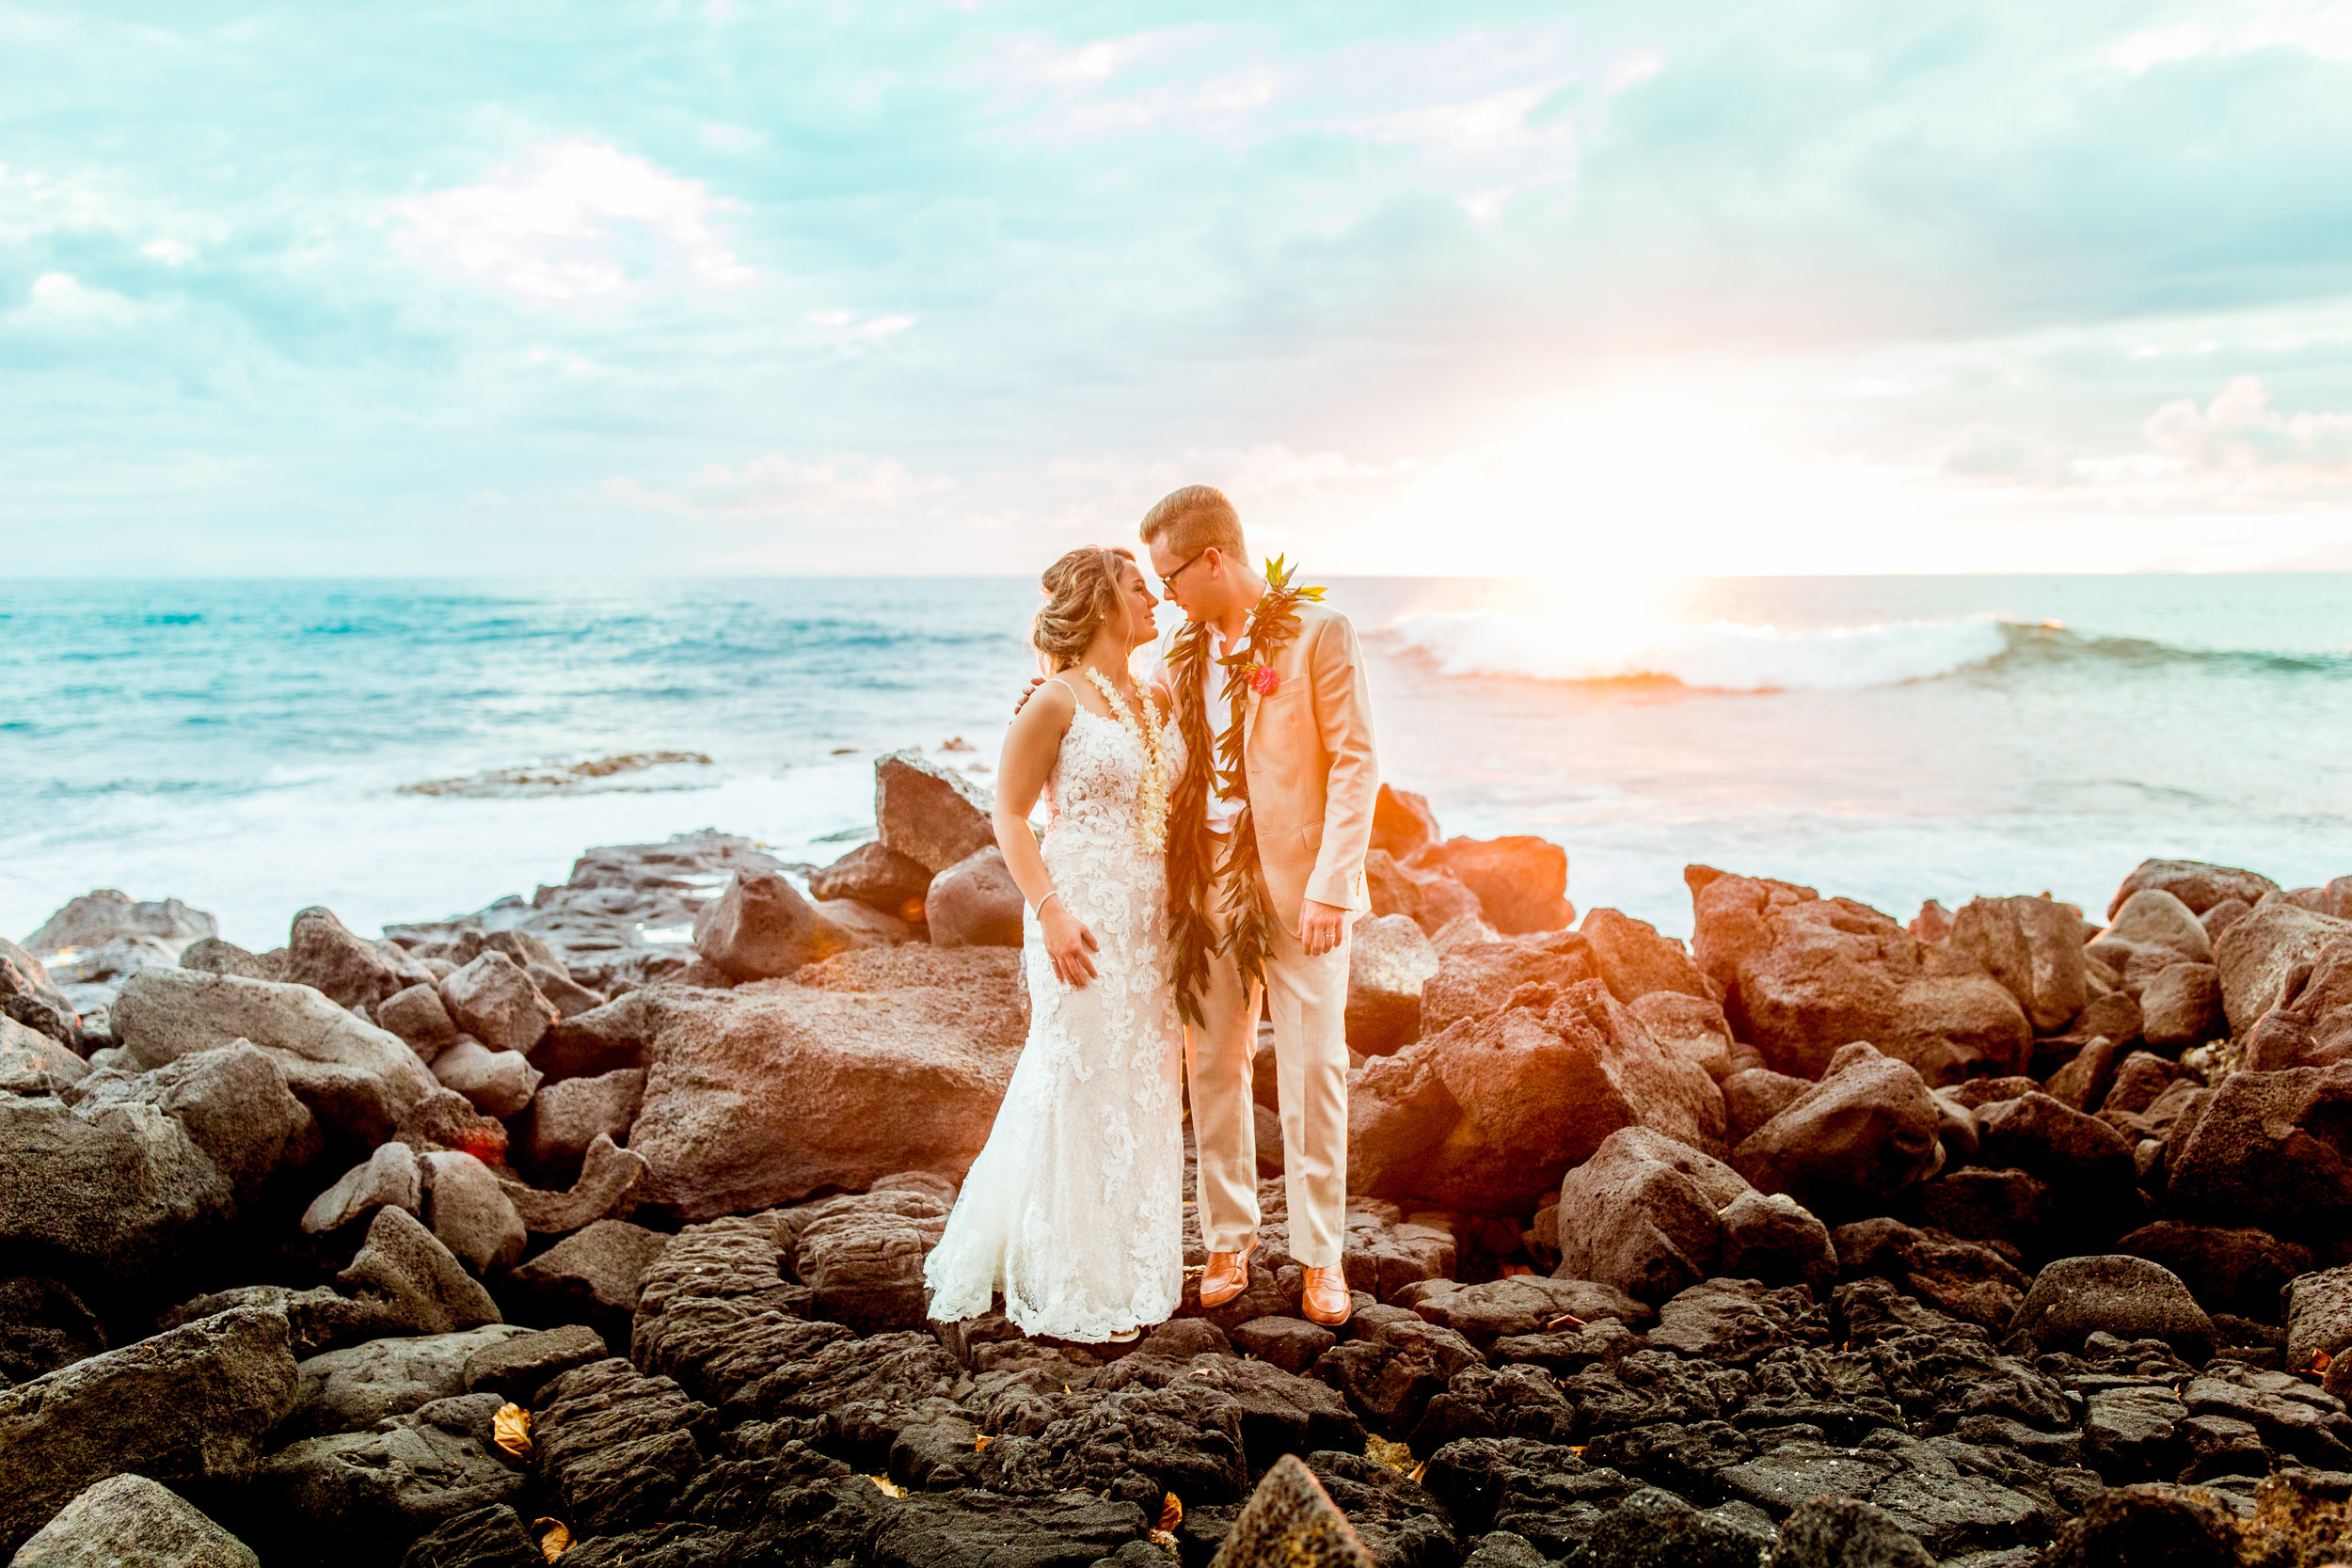 kelilina photography hawaii florida destination wedding photographer-12.jpg